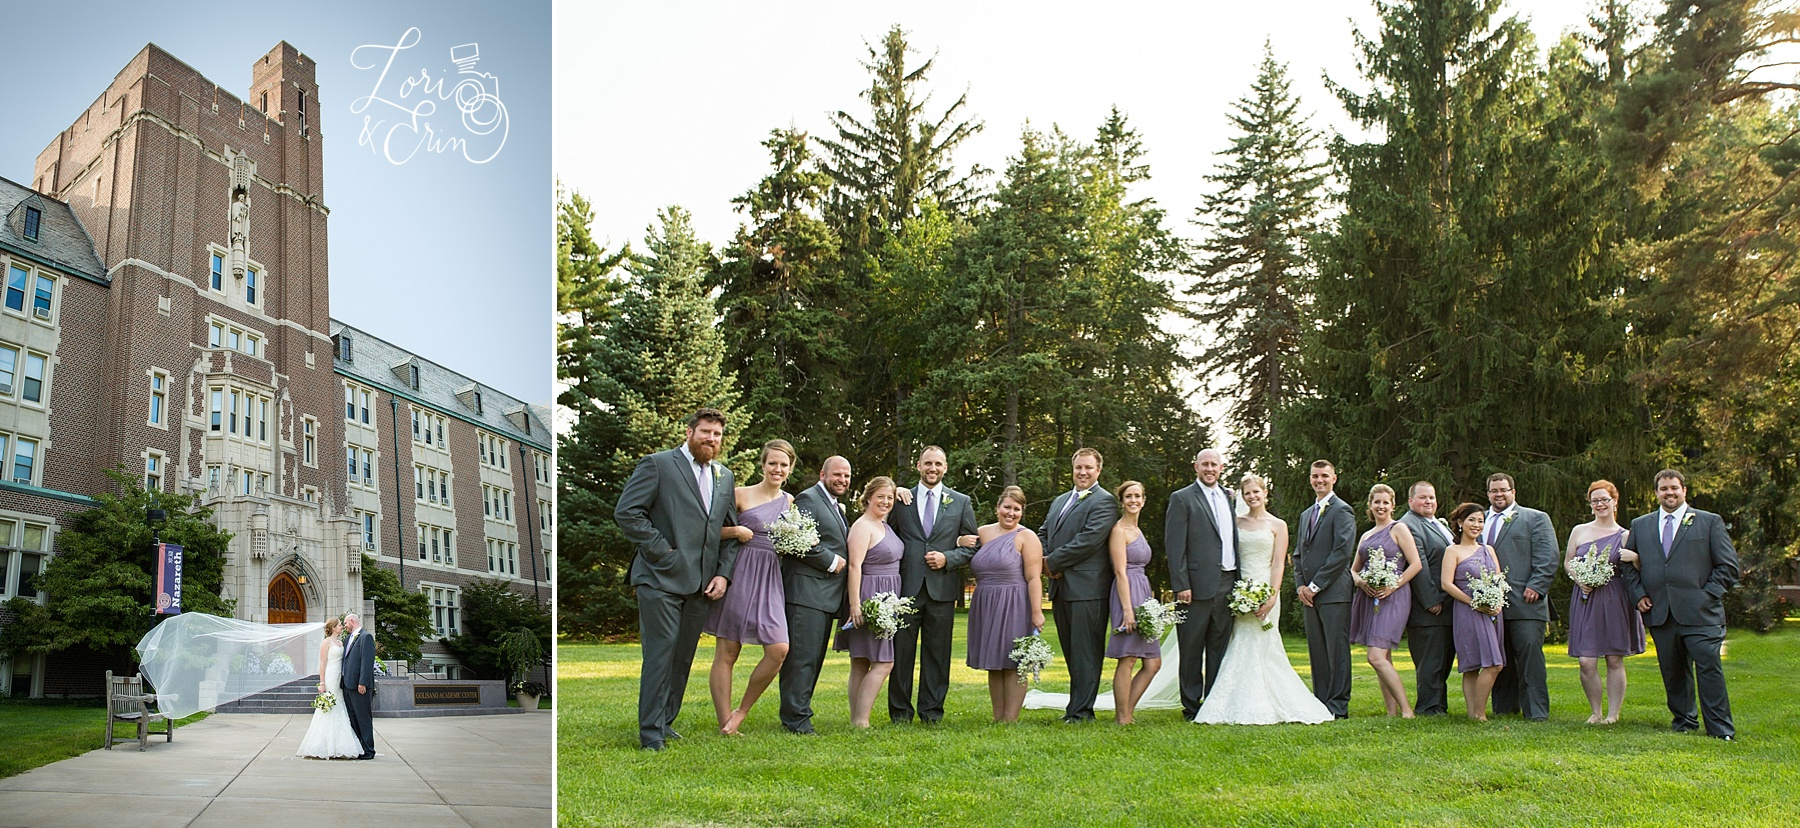 Nazareth Chapel Wedding, Rochester NY Wedding Photography